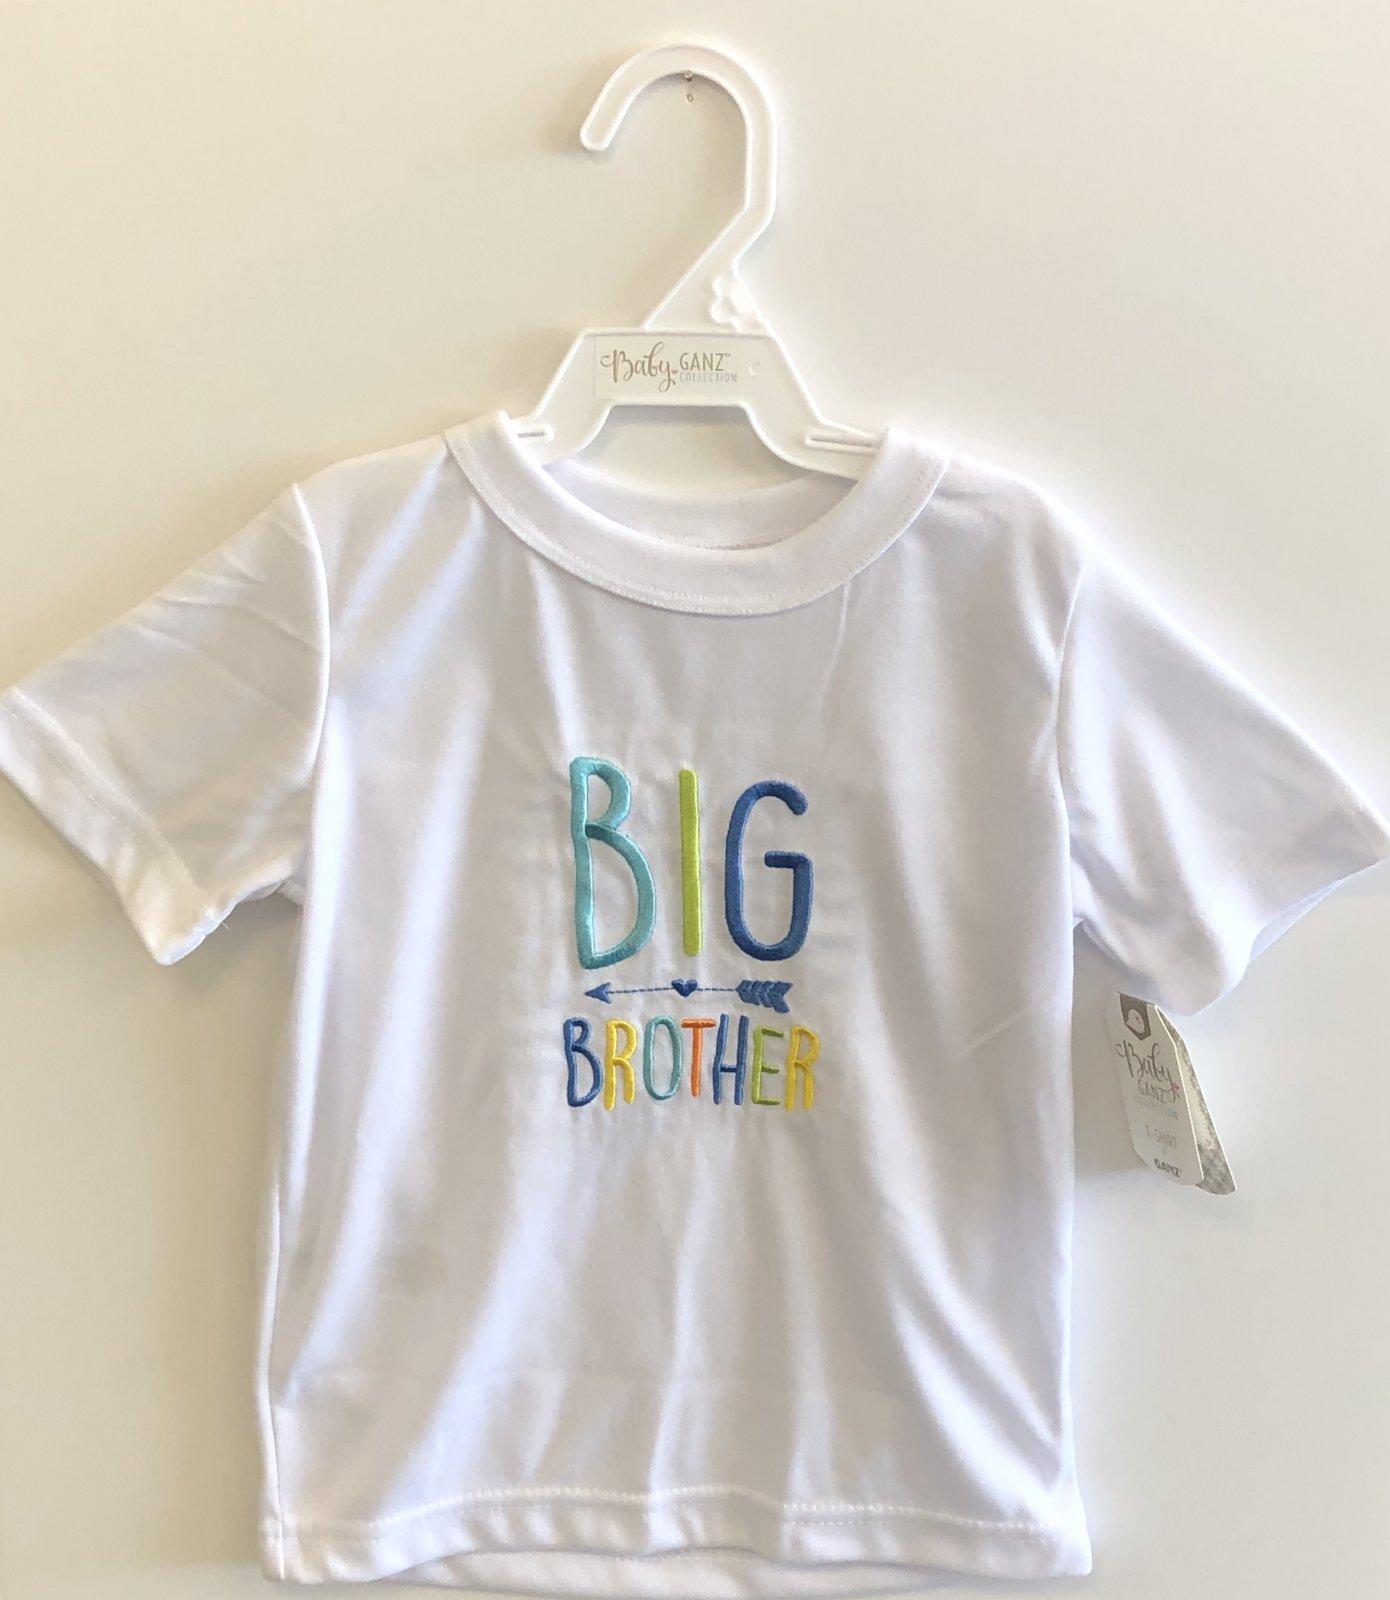 Ganz | Big Brother T-Shirt